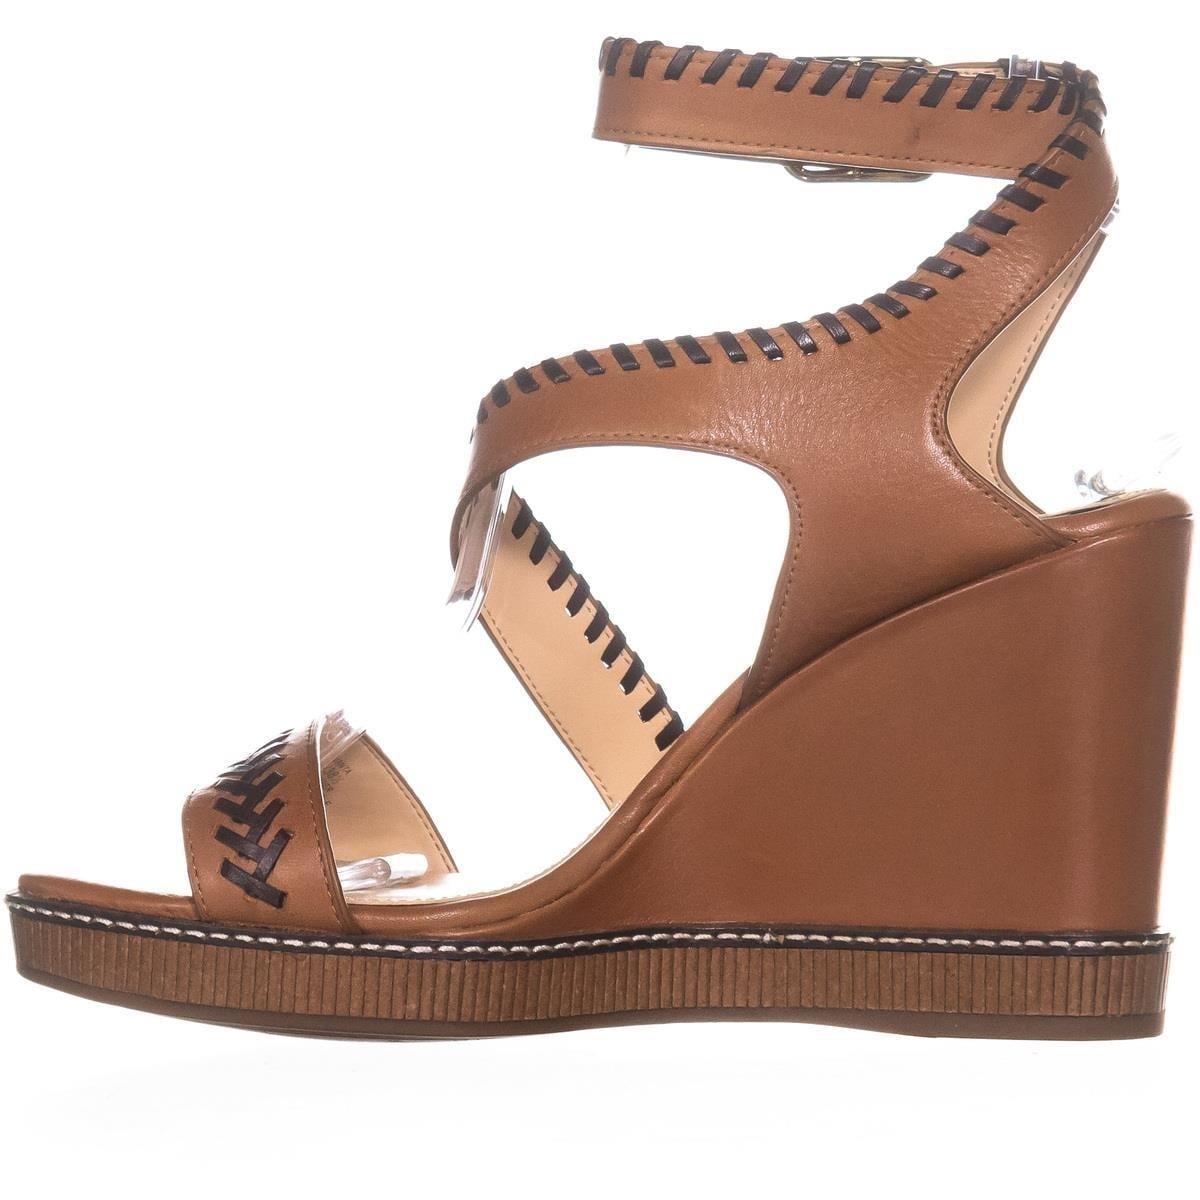 786a81c51ca5 Shop Vince Camuto Ivanta Strappy Wedge Sandals